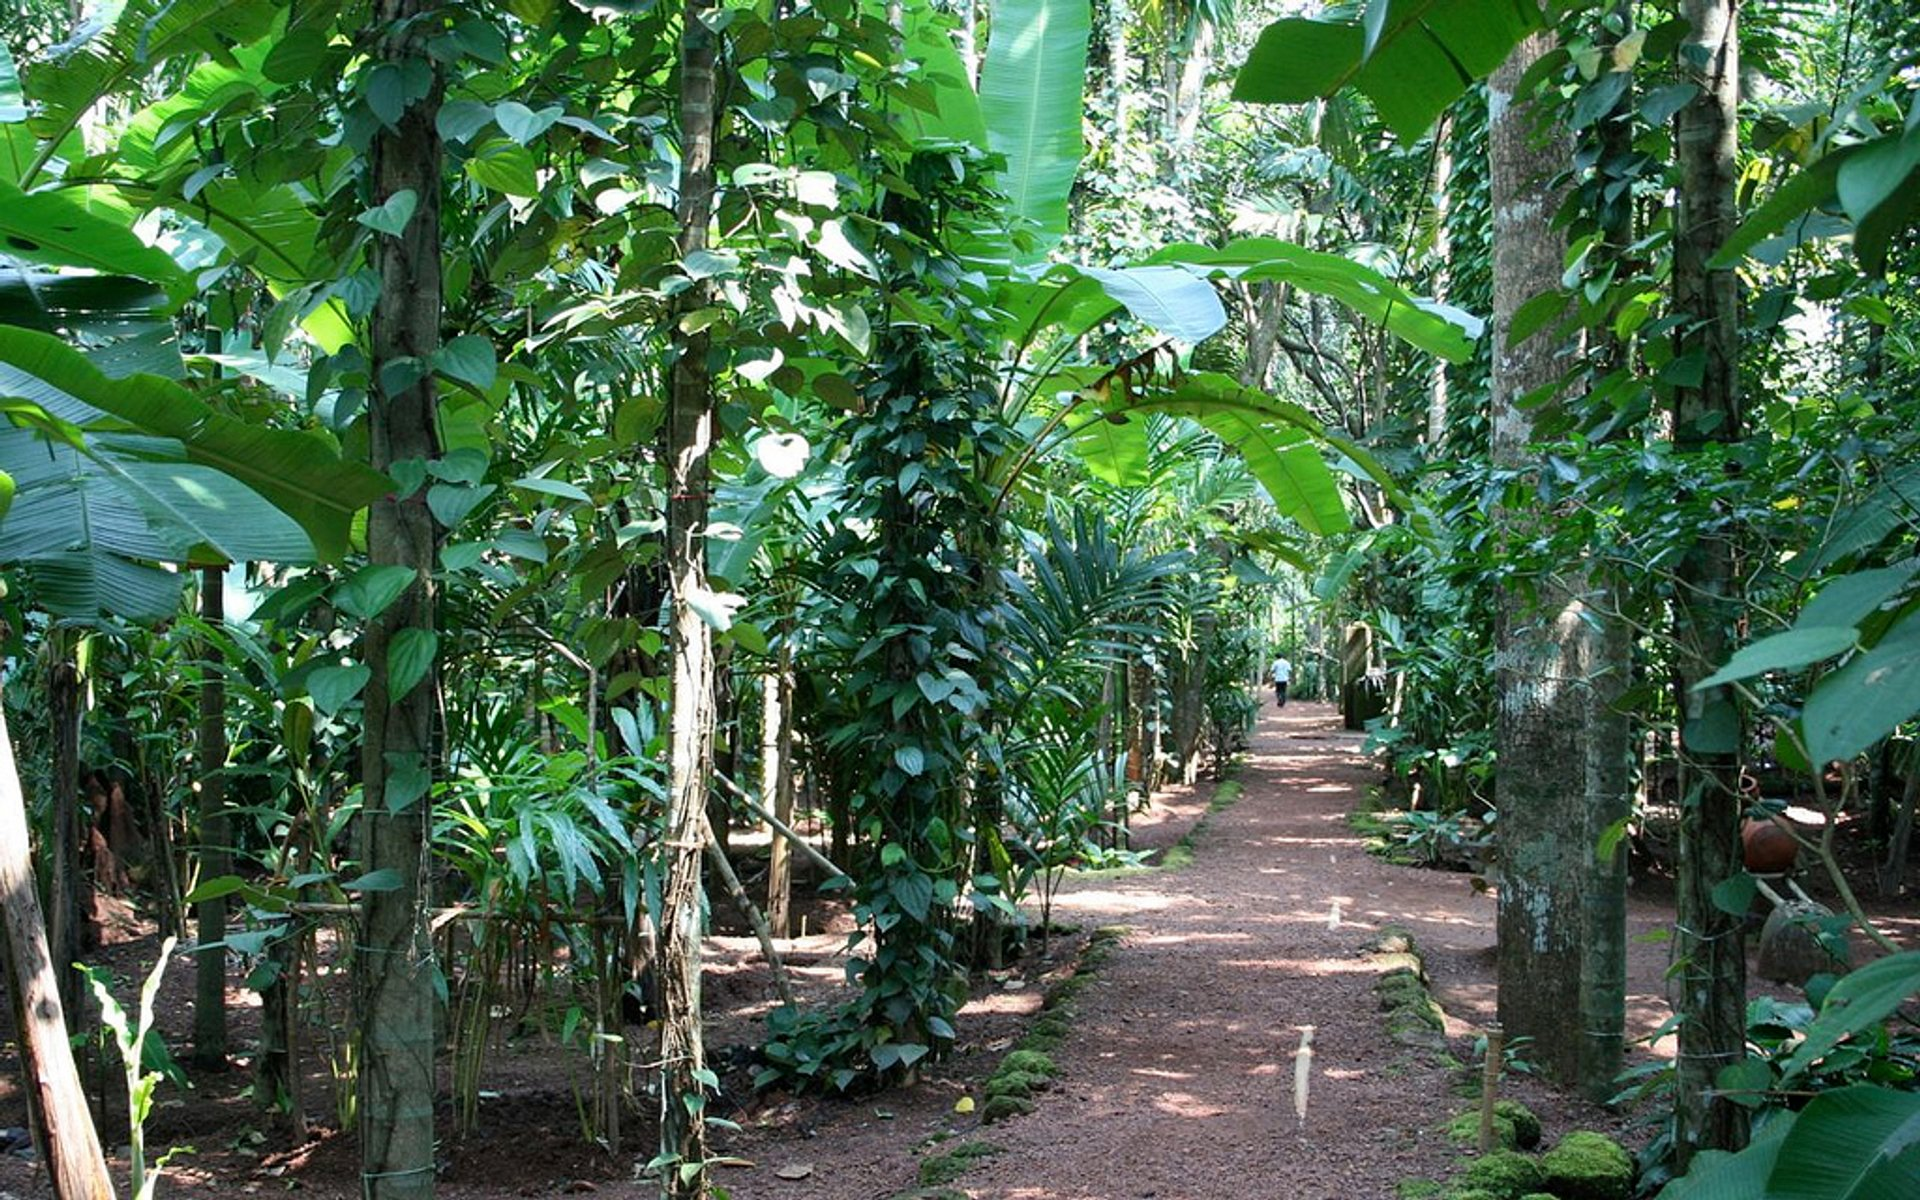 Spice garden on Tropical Spice Farm, Ponda 2019